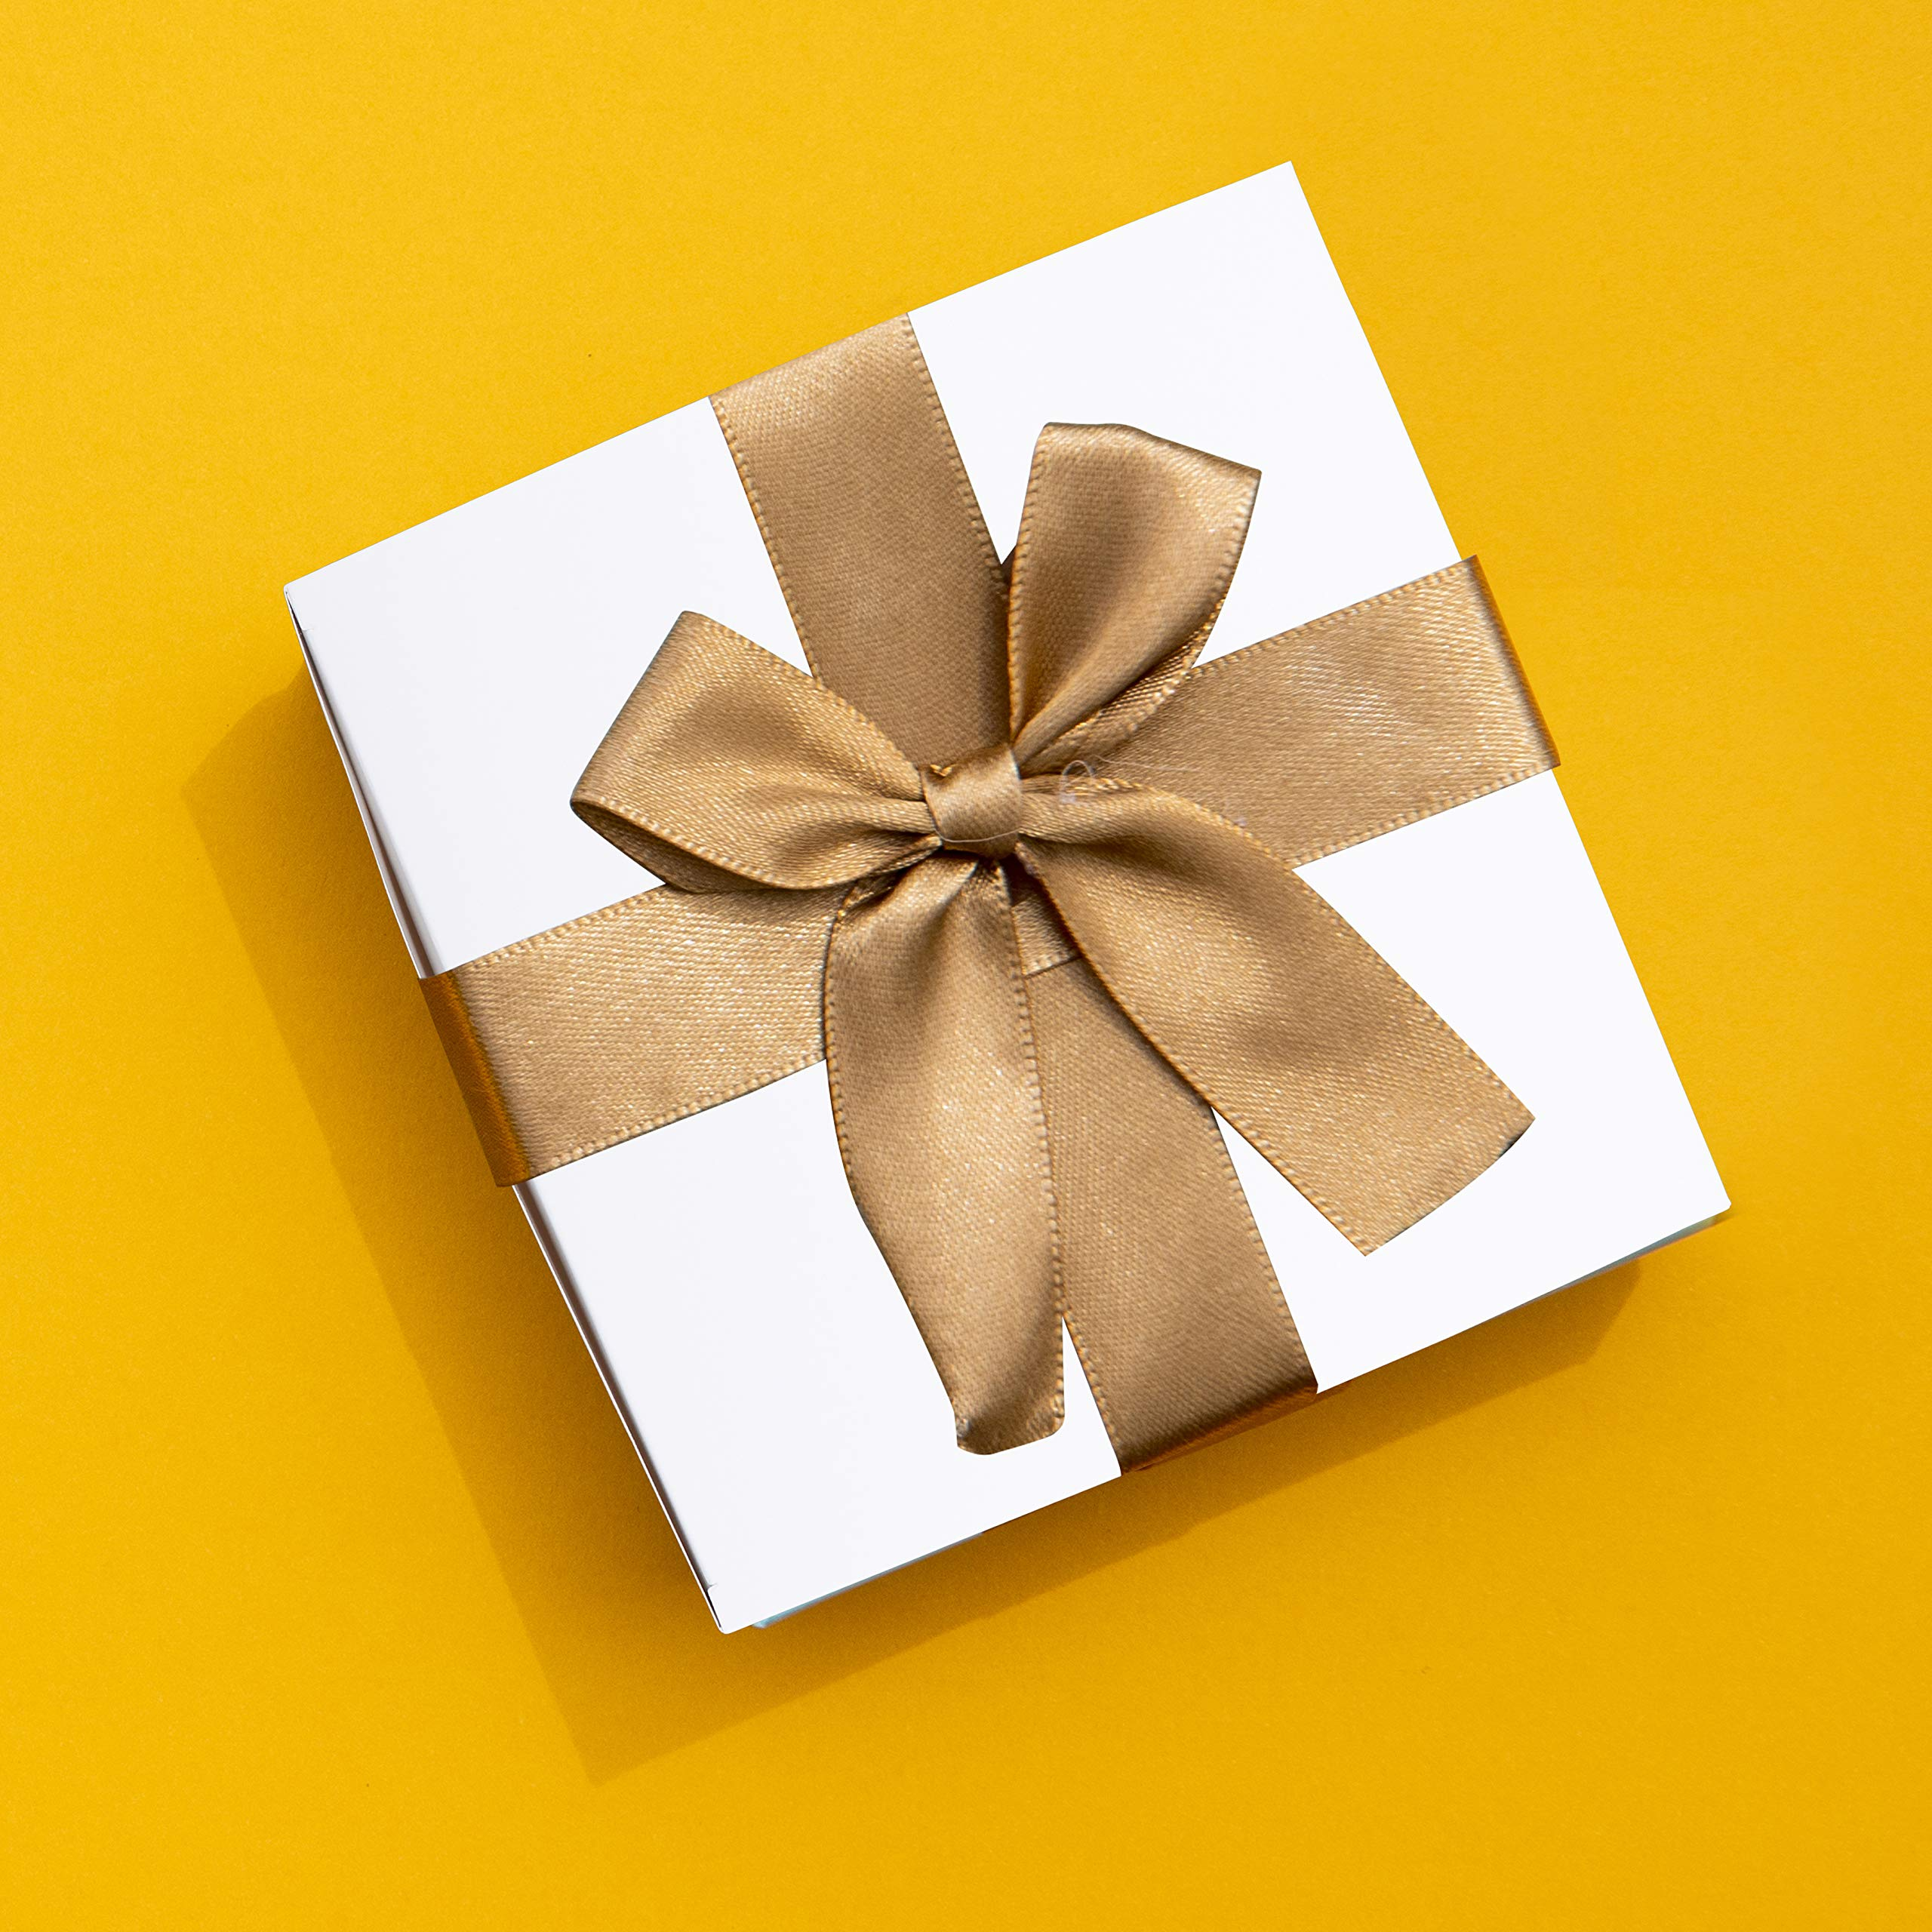 5 x WHITE SHIPPING BOXES GIFT PRESENT WEDDING PRESENTATION PACKET 20 x 15 x 6cm